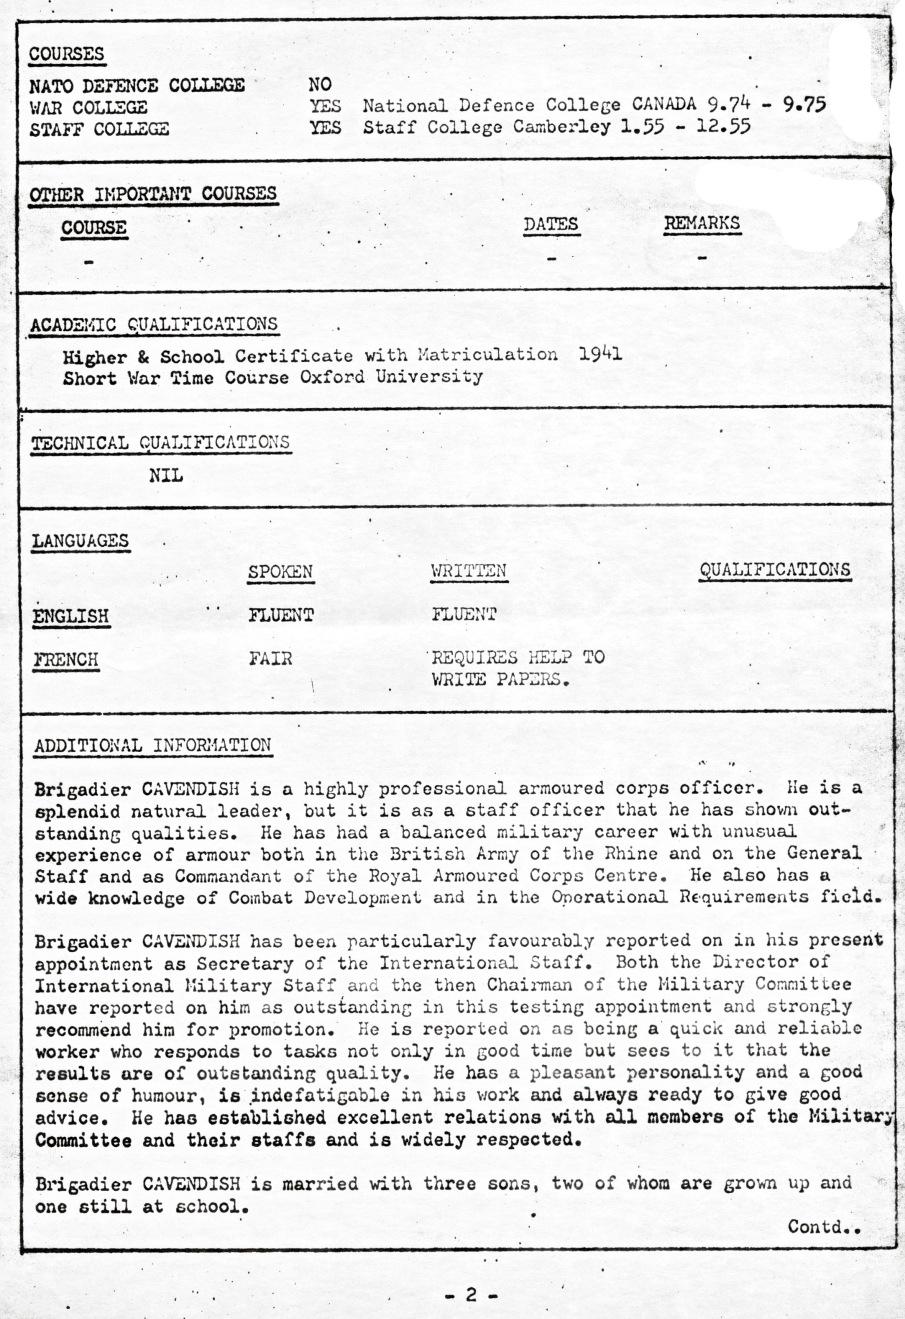 00830 977-07-12 Cargo na NATO - MOD UK comunica candidatura e currículo Brigadier P B Cavendish aos cargos NATO -pg 3